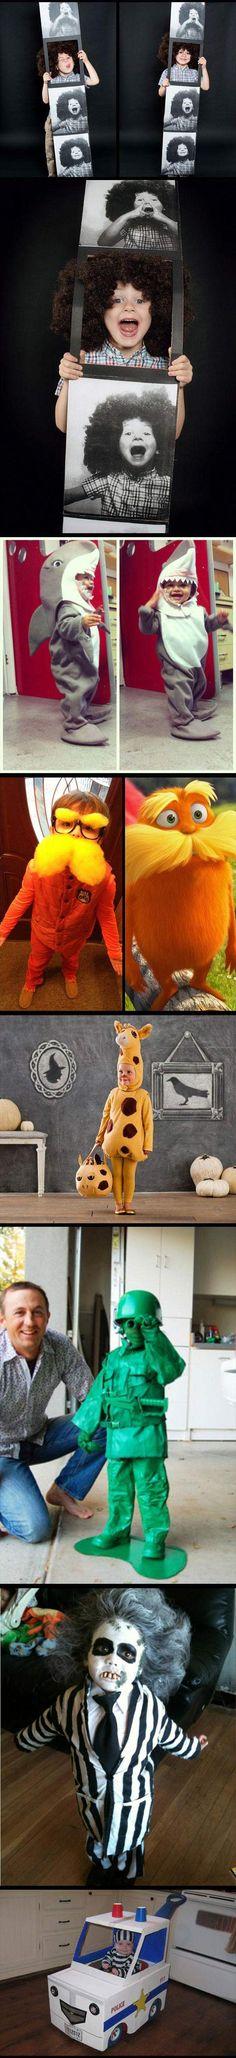 funny-kids-Halloween-costume-police